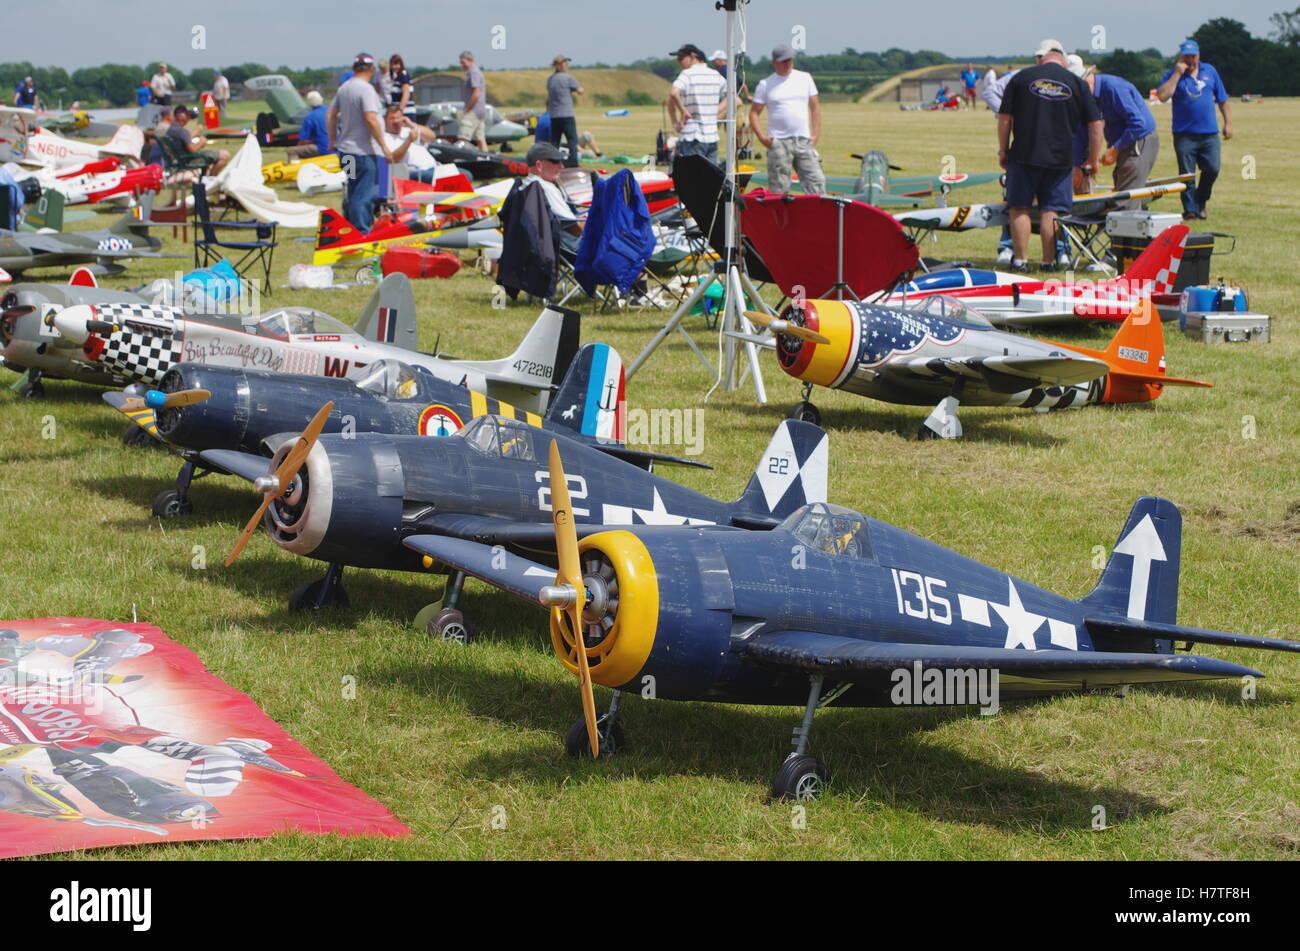 Larga scala aereo modello a RAF Cosford Airfield Immagini Stock